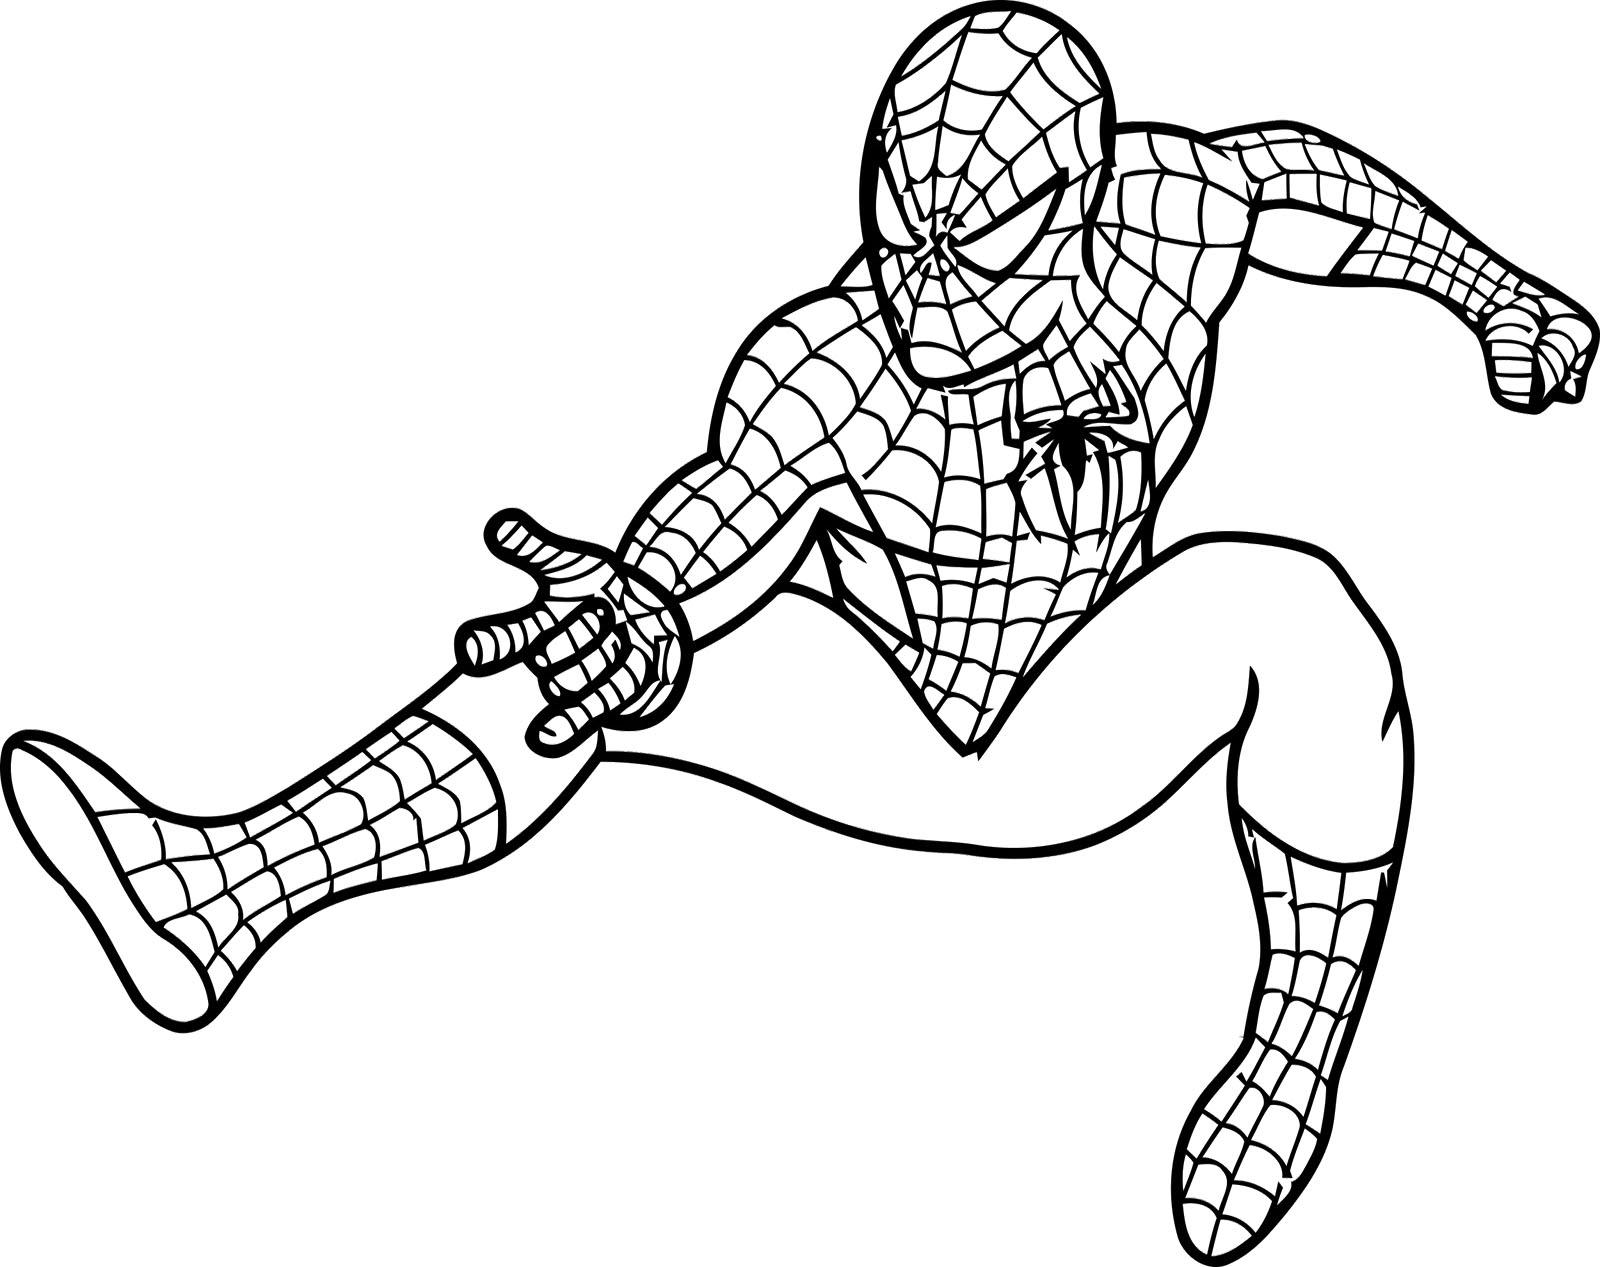 Spiderman clipart black and white Kid 2 black man Spiderman